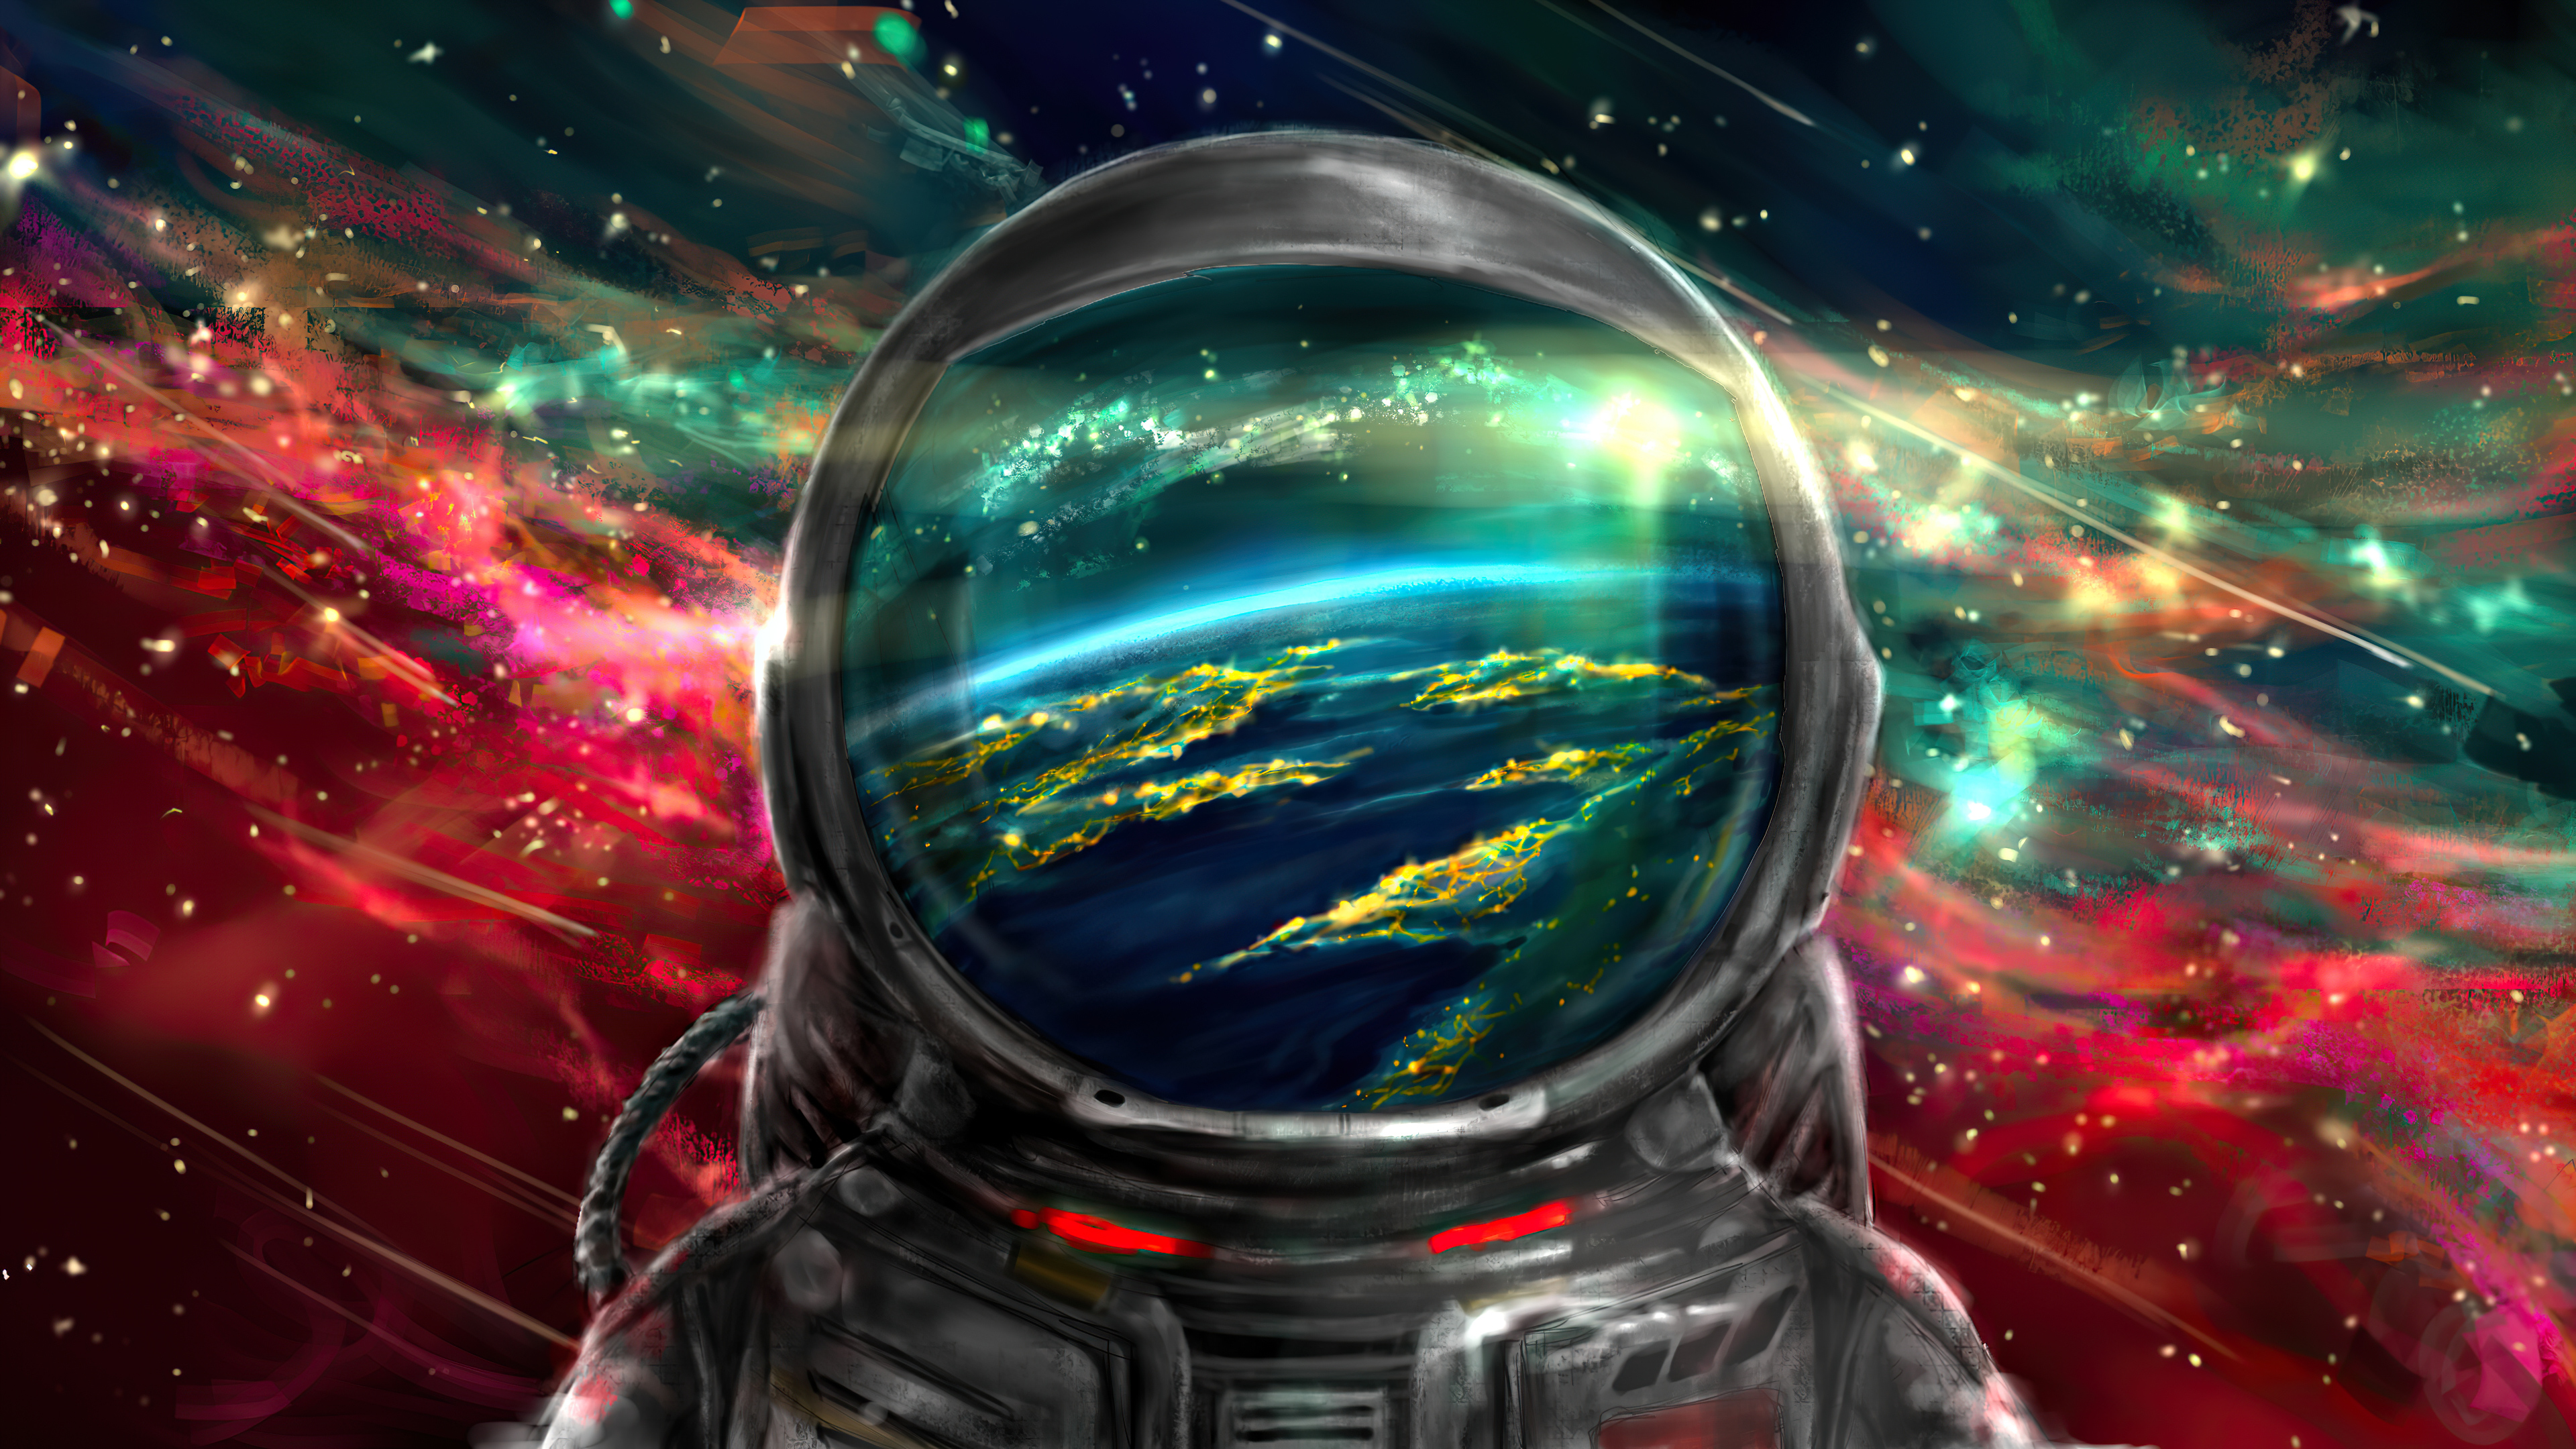 Astronaut 4k Ultra Hd Wallpaper Background Image 3840x2160 Id 1080246 Wallpaper Abyss